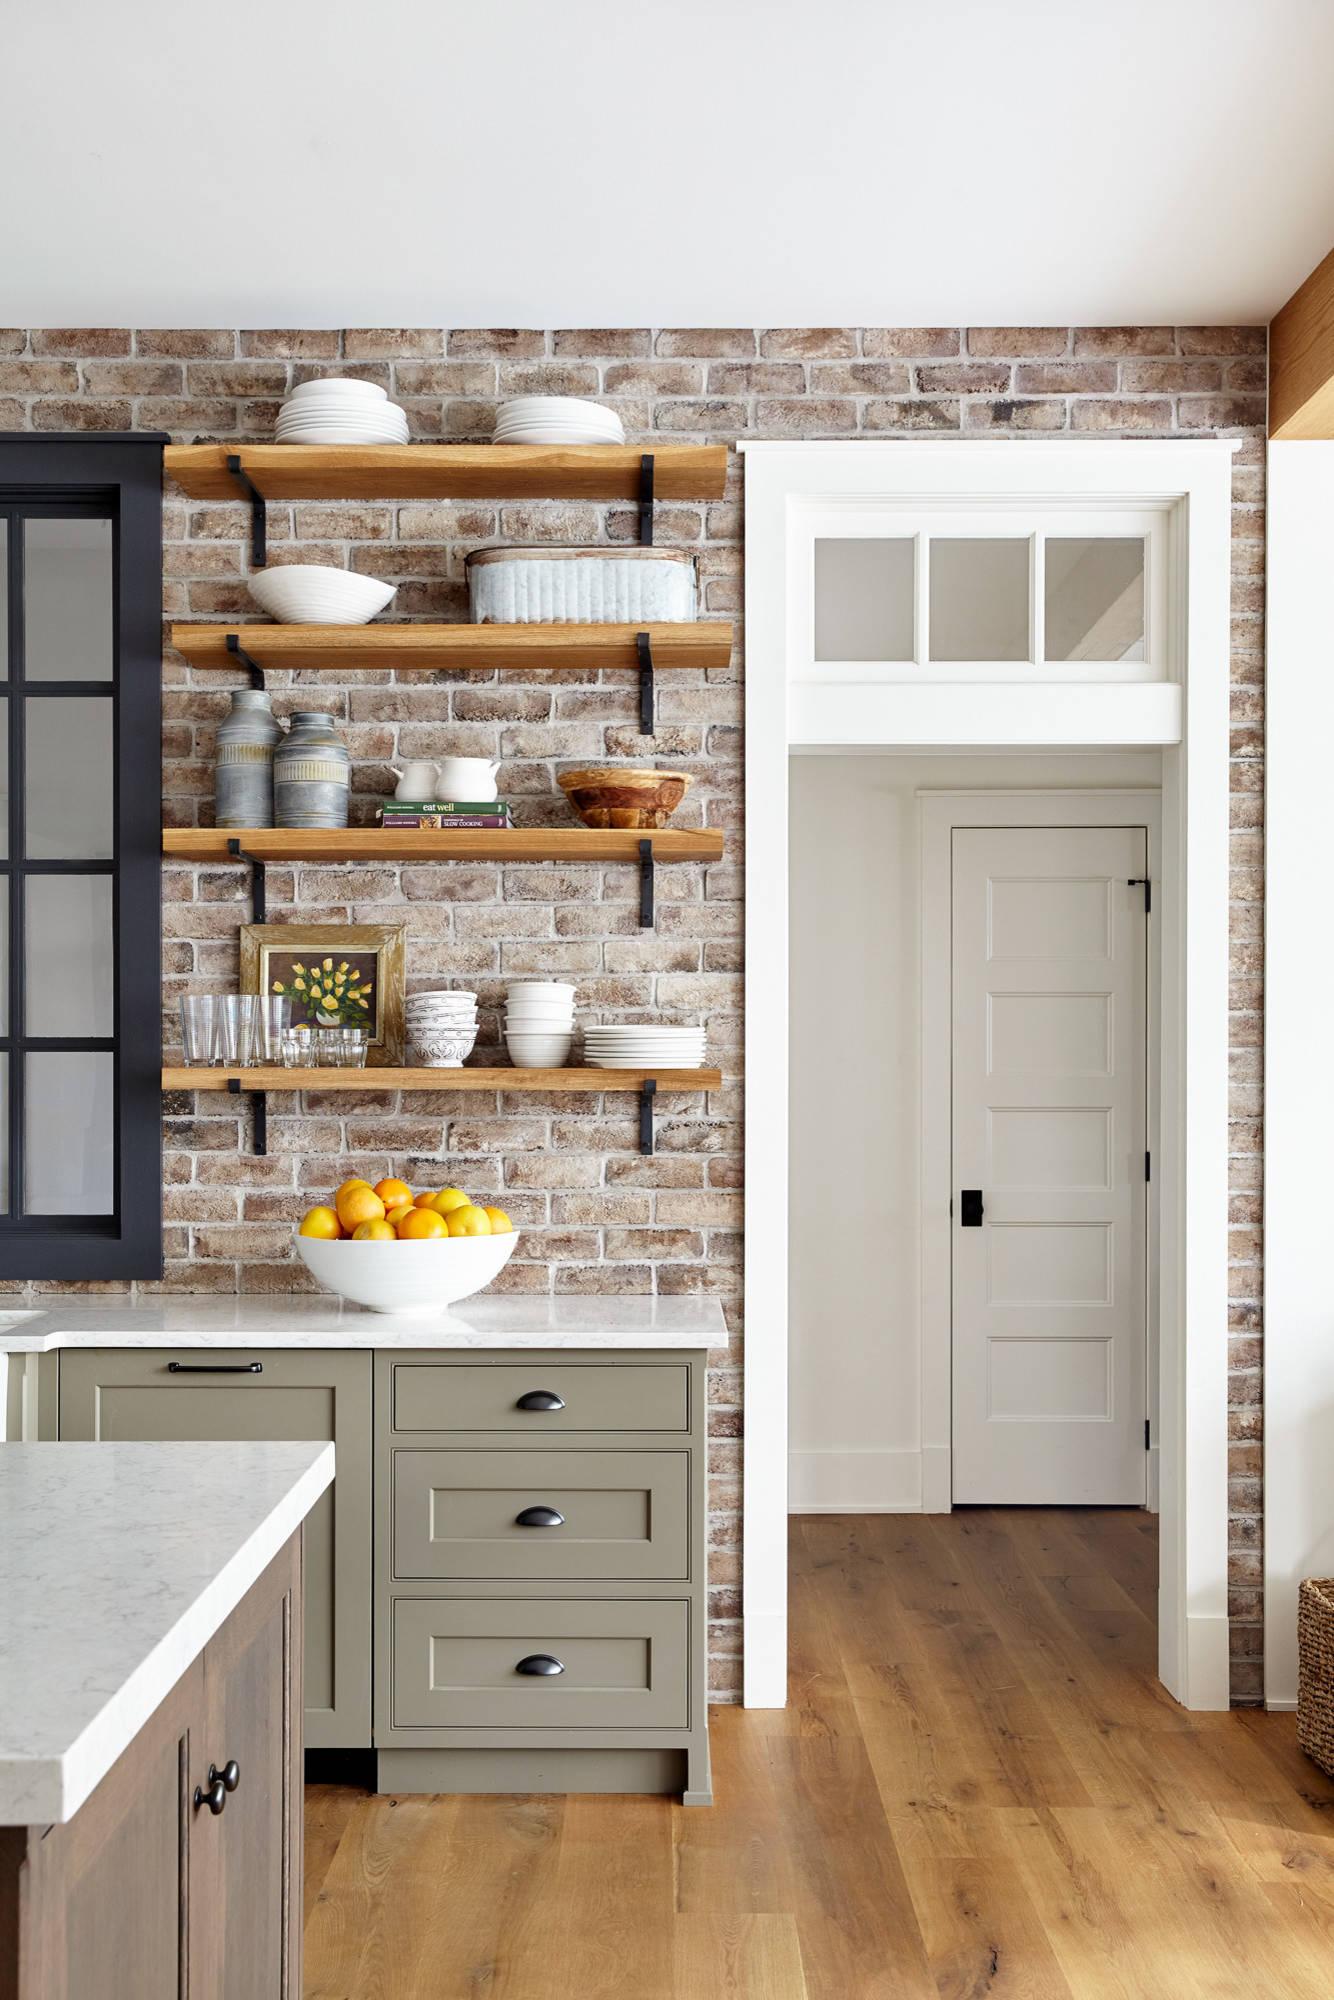 75 Beautiful Kitchen With Brick Backsplash Pictures Ideas April 2021 Houzz